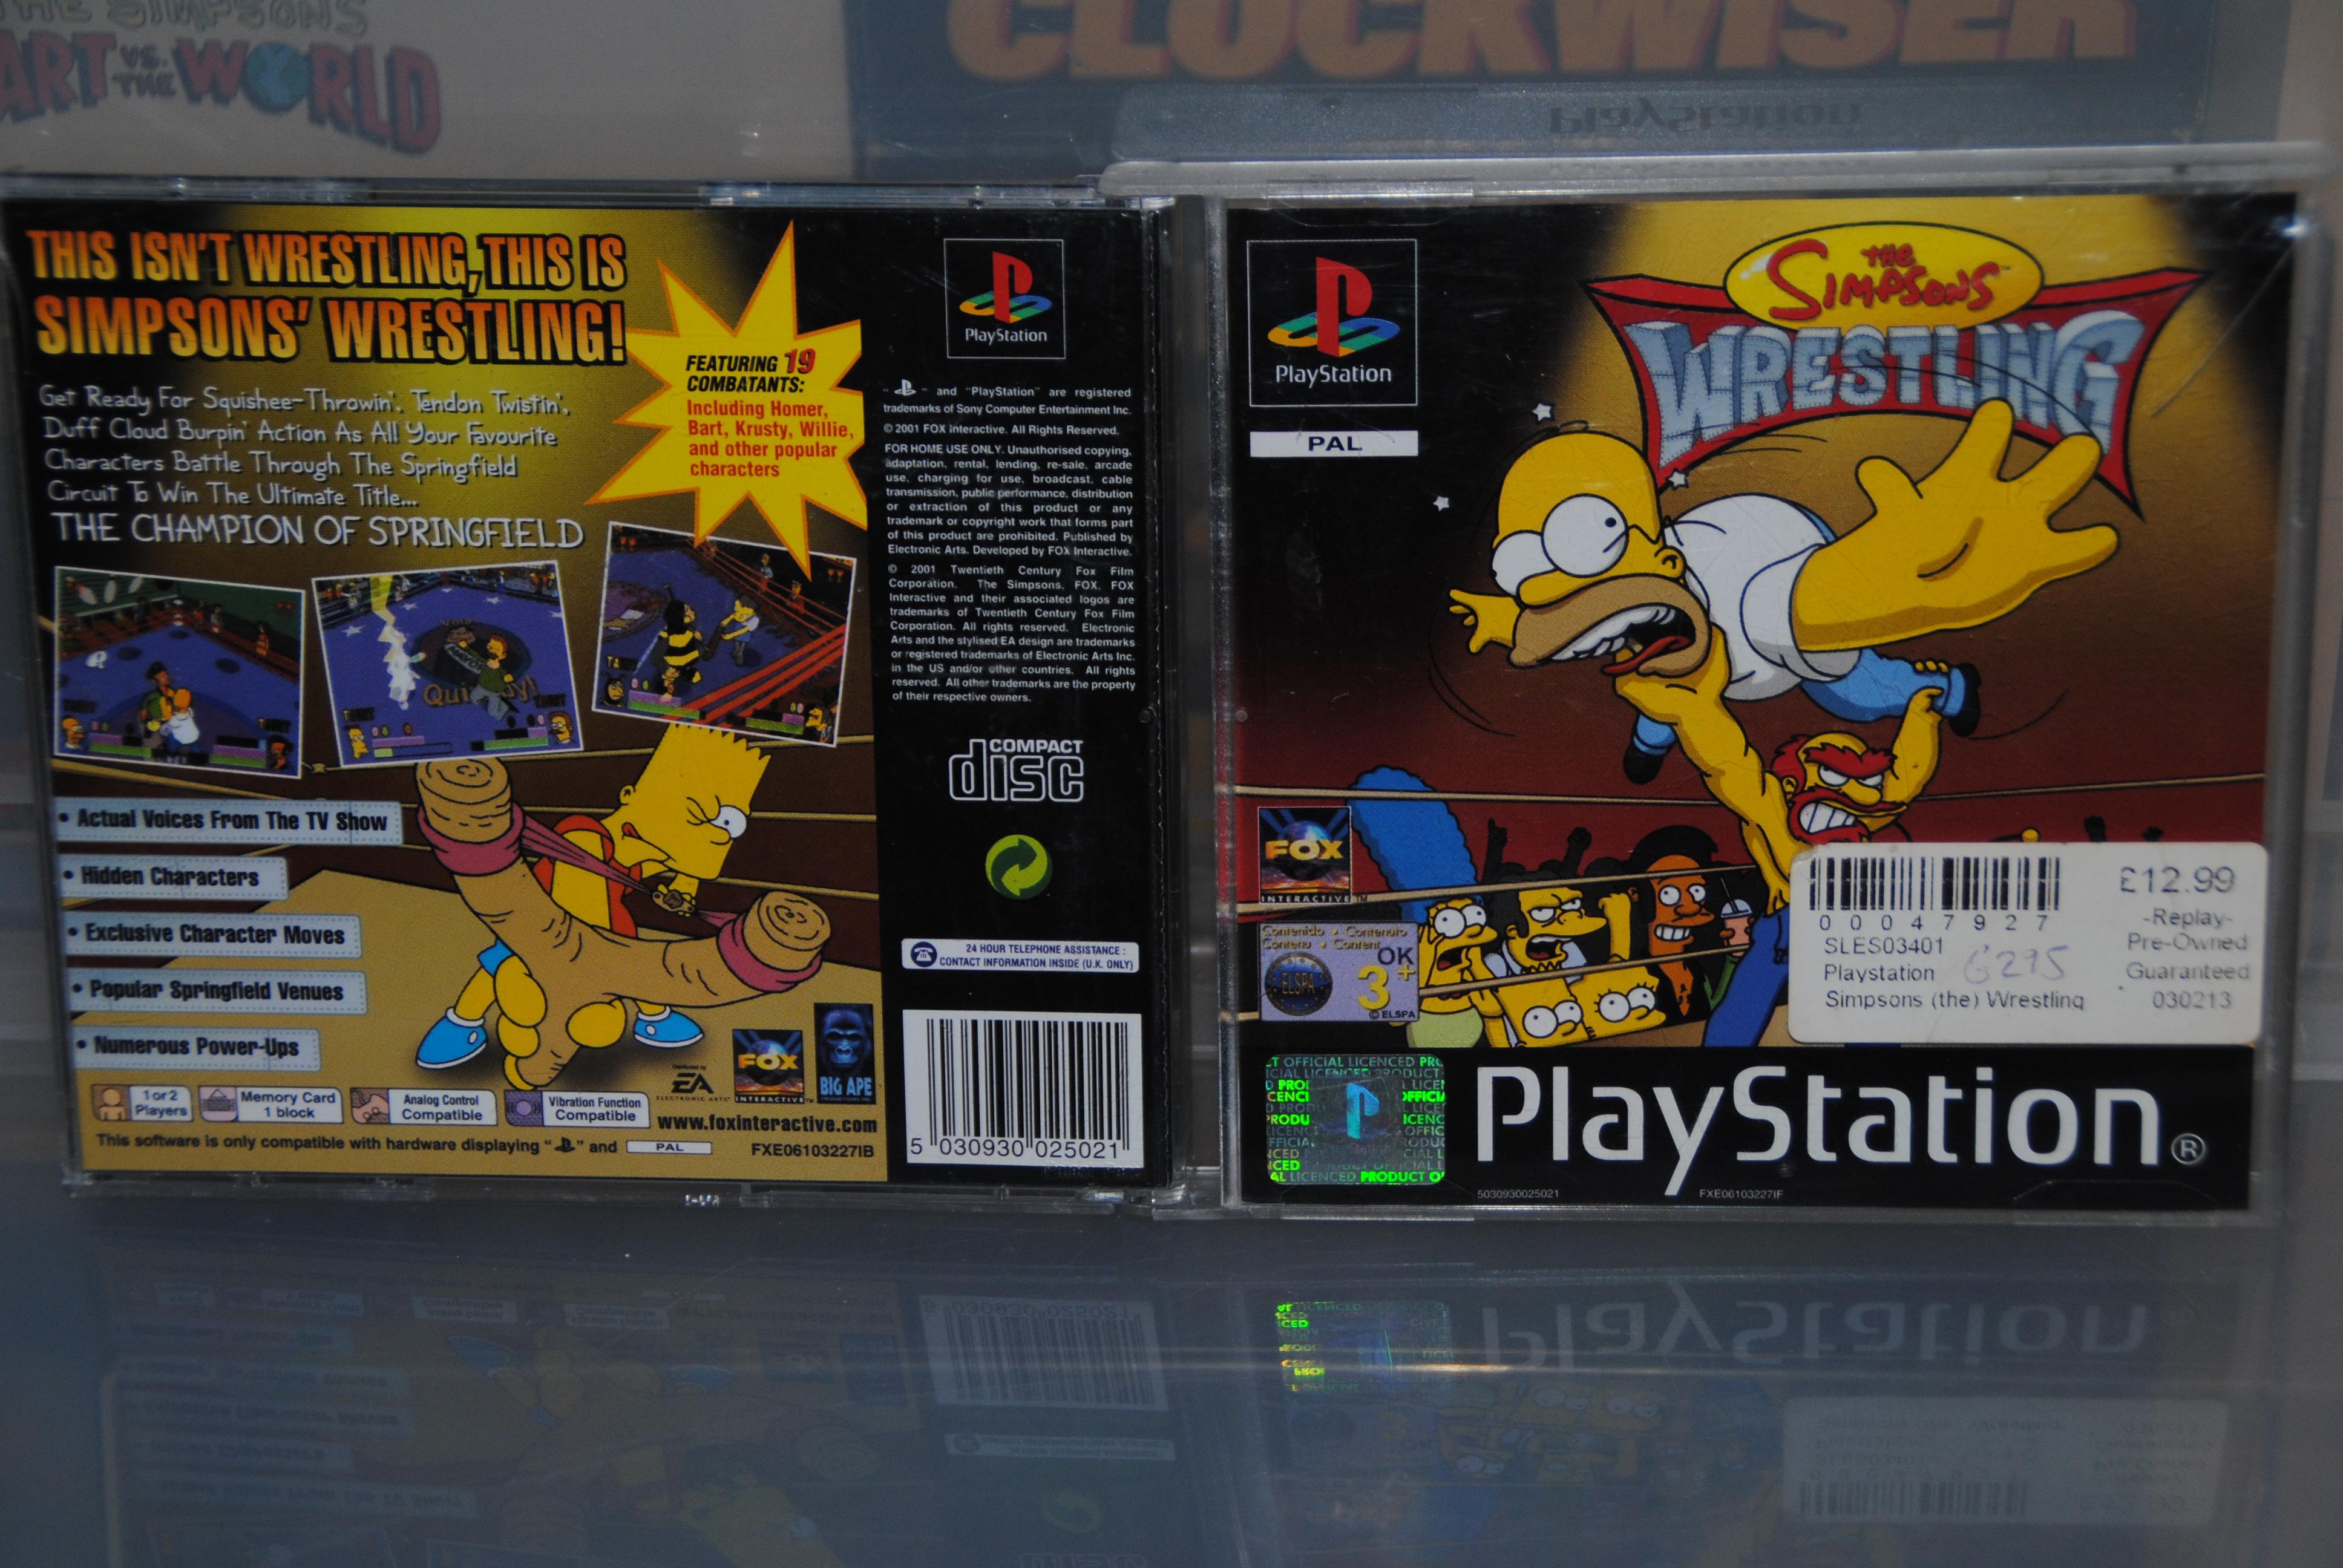 FOX - Simpsons Wrestling Cover